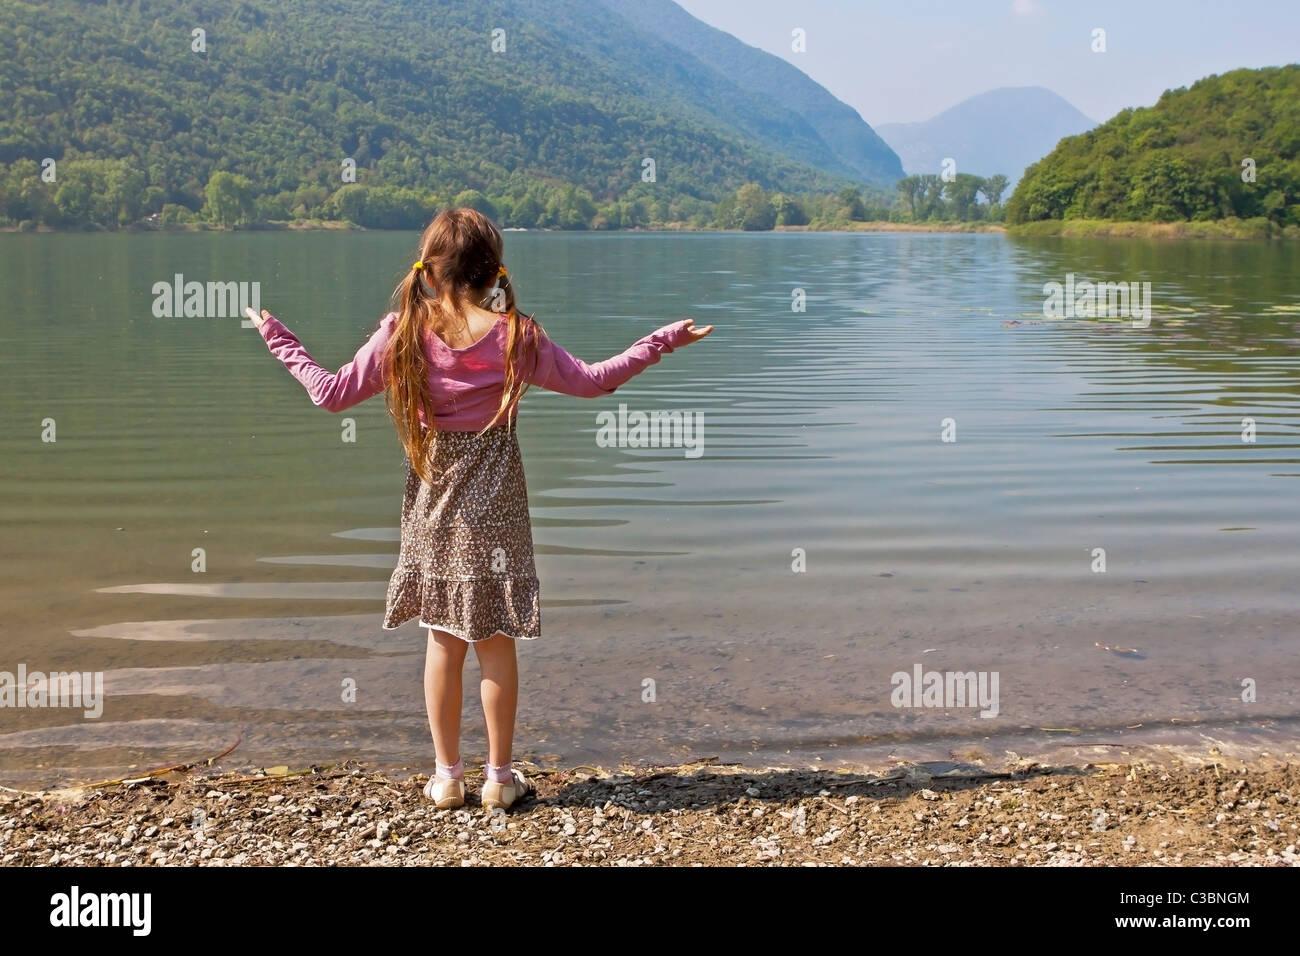 girl at tarn - Stock Image